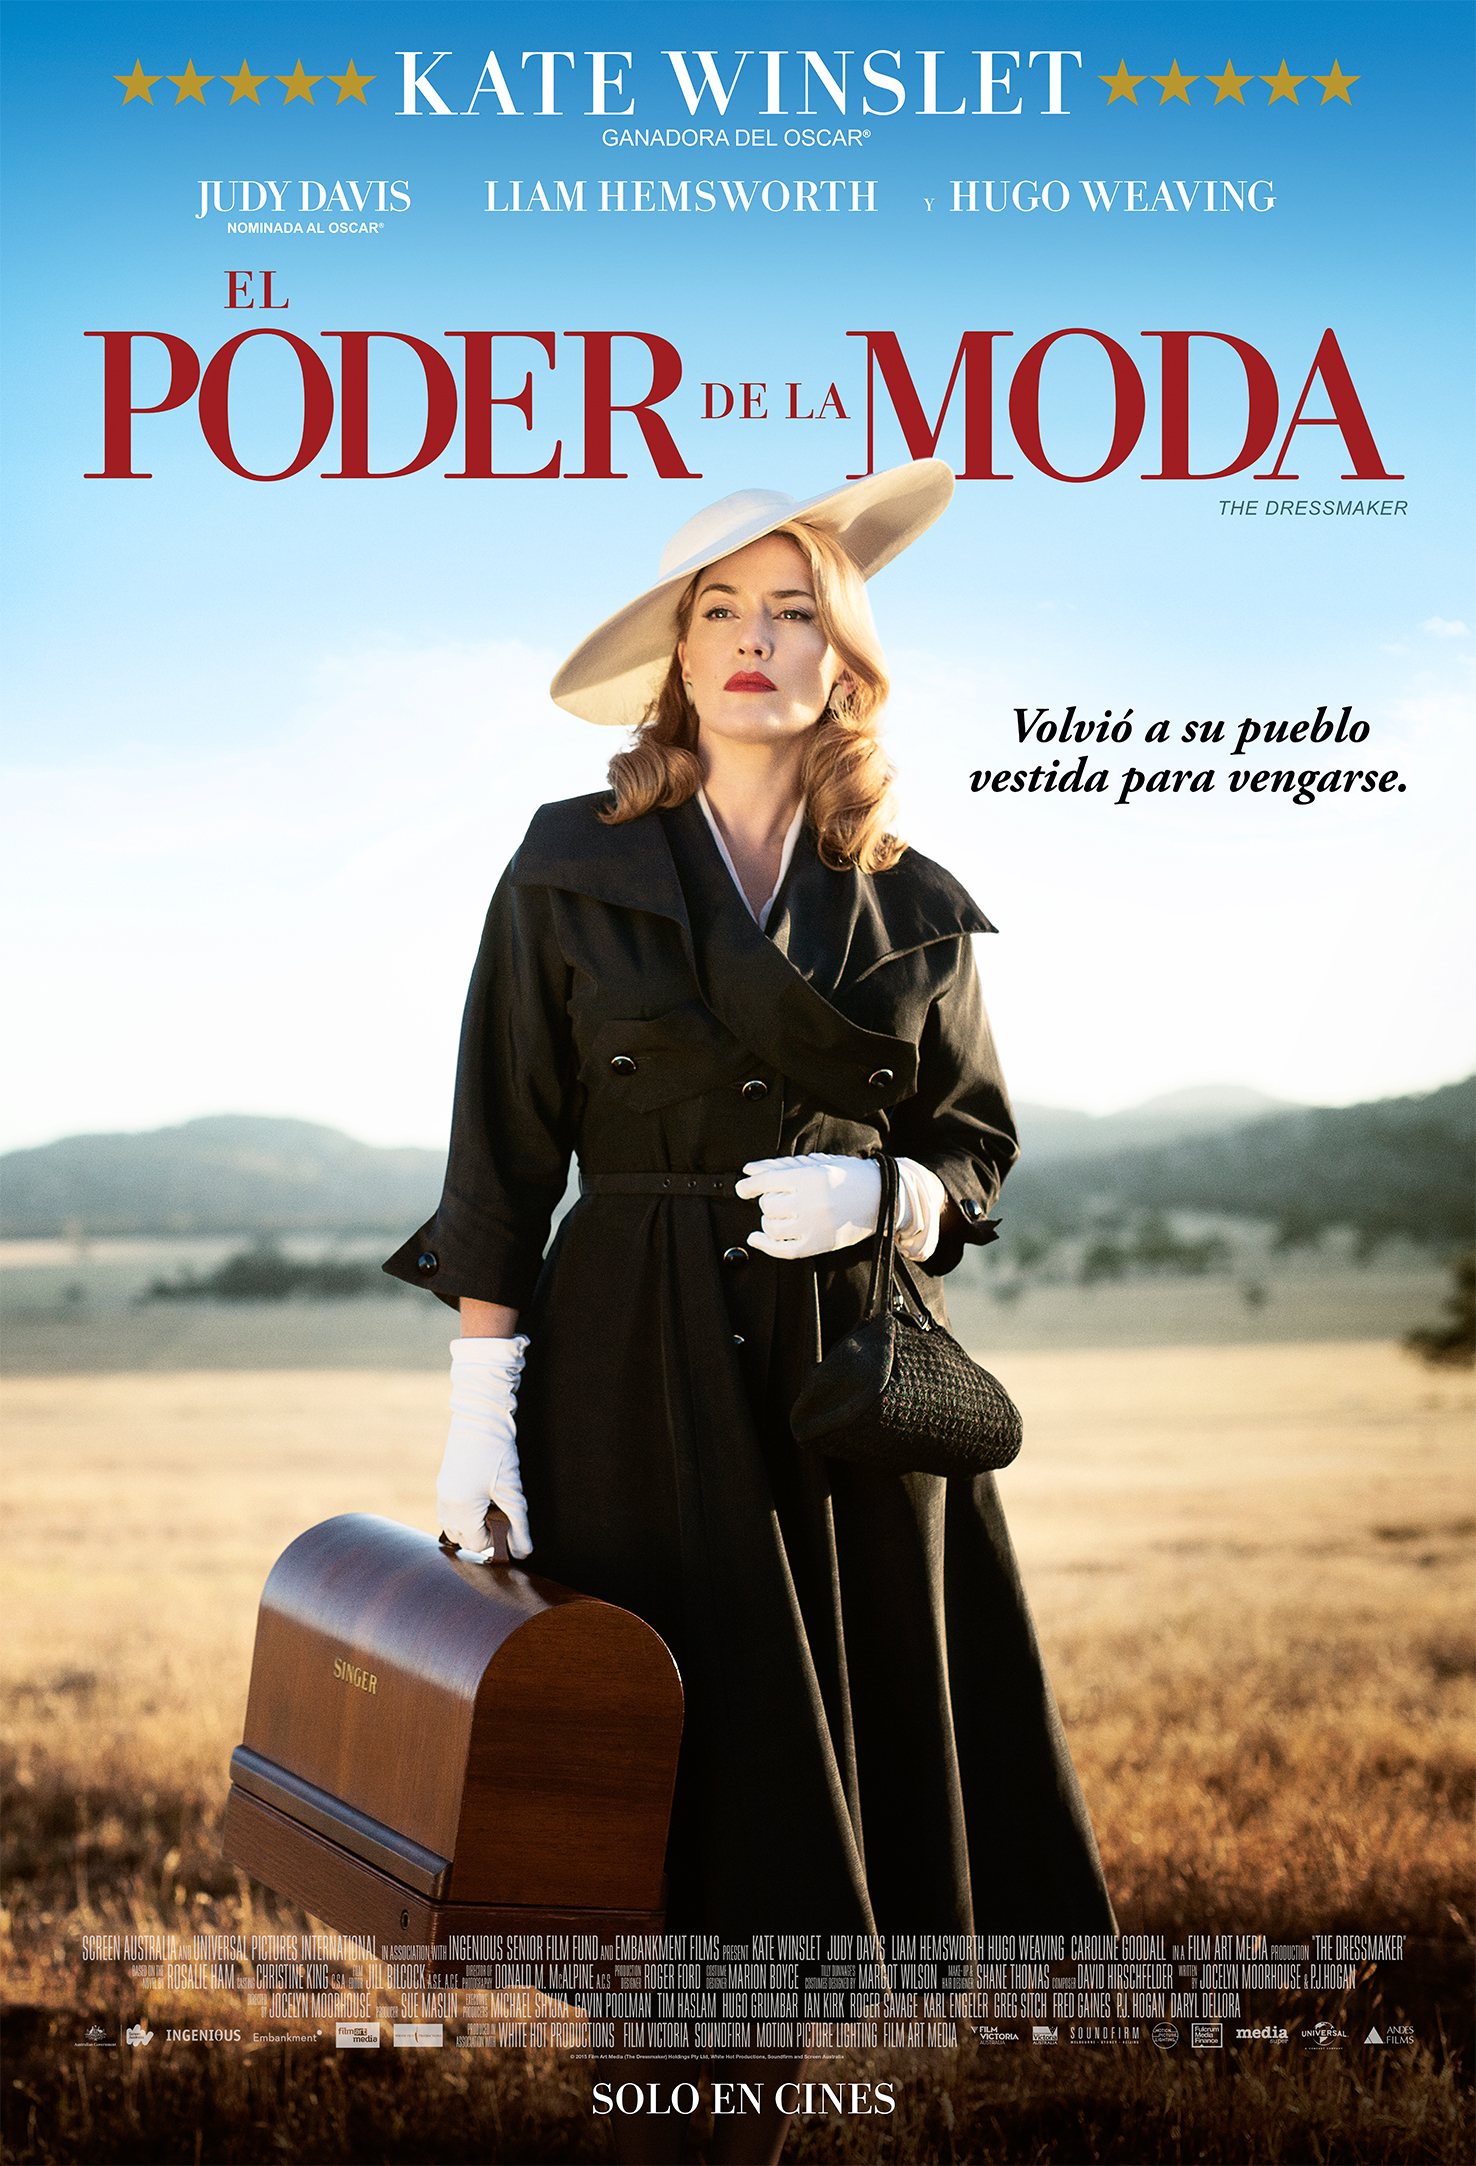 http://www.andesfilms.com.pe/el-poder-de-la-moda/